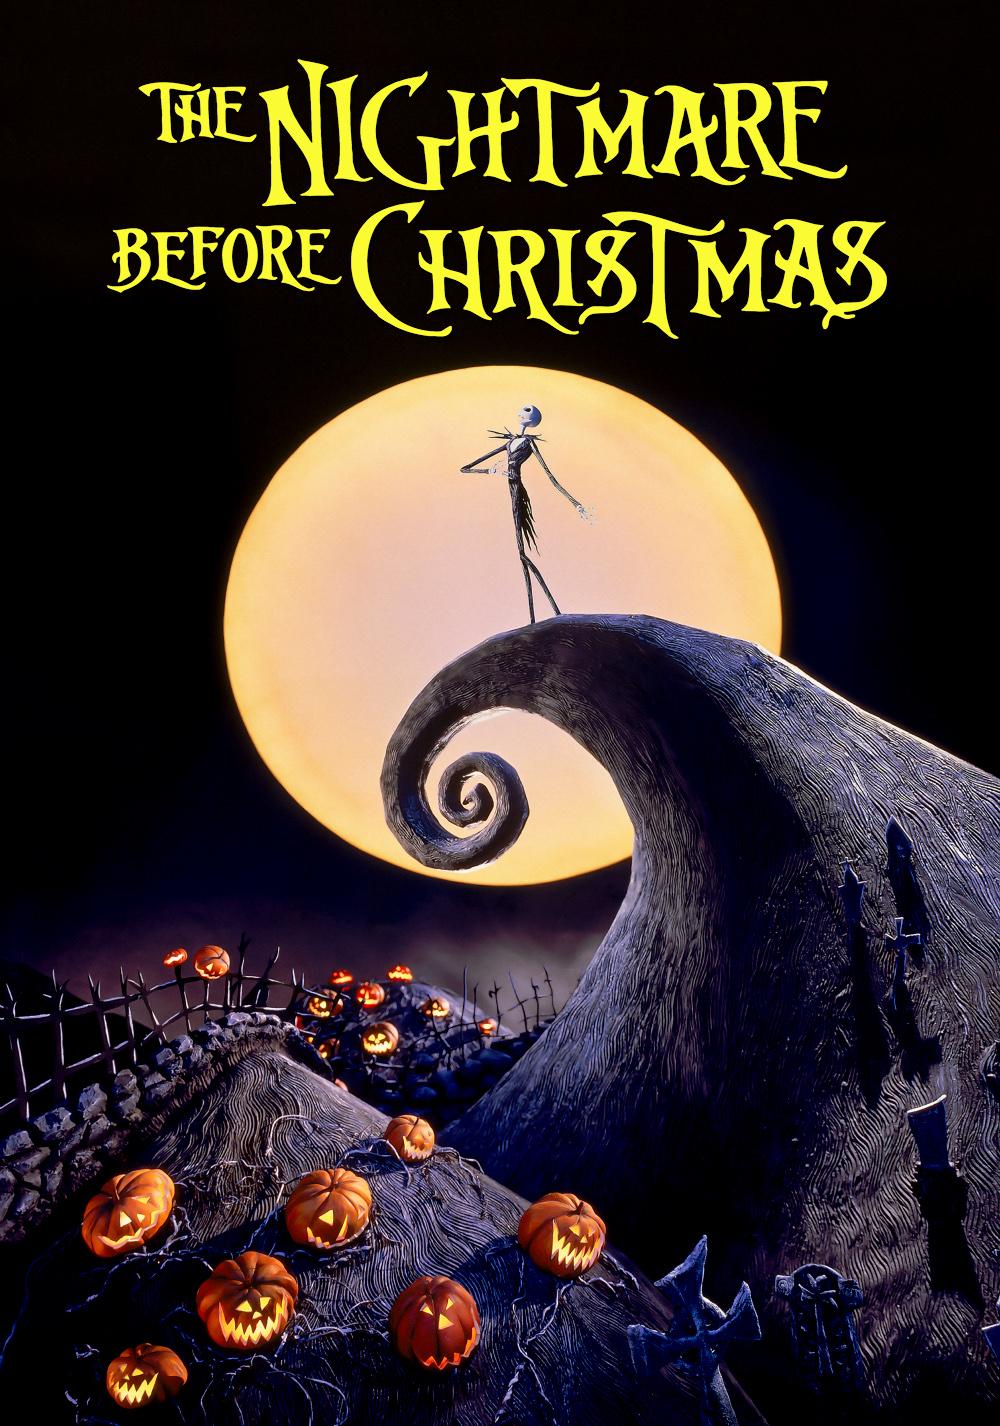 the-nightmare-before-christmas-54ebd7ec25354.jpg